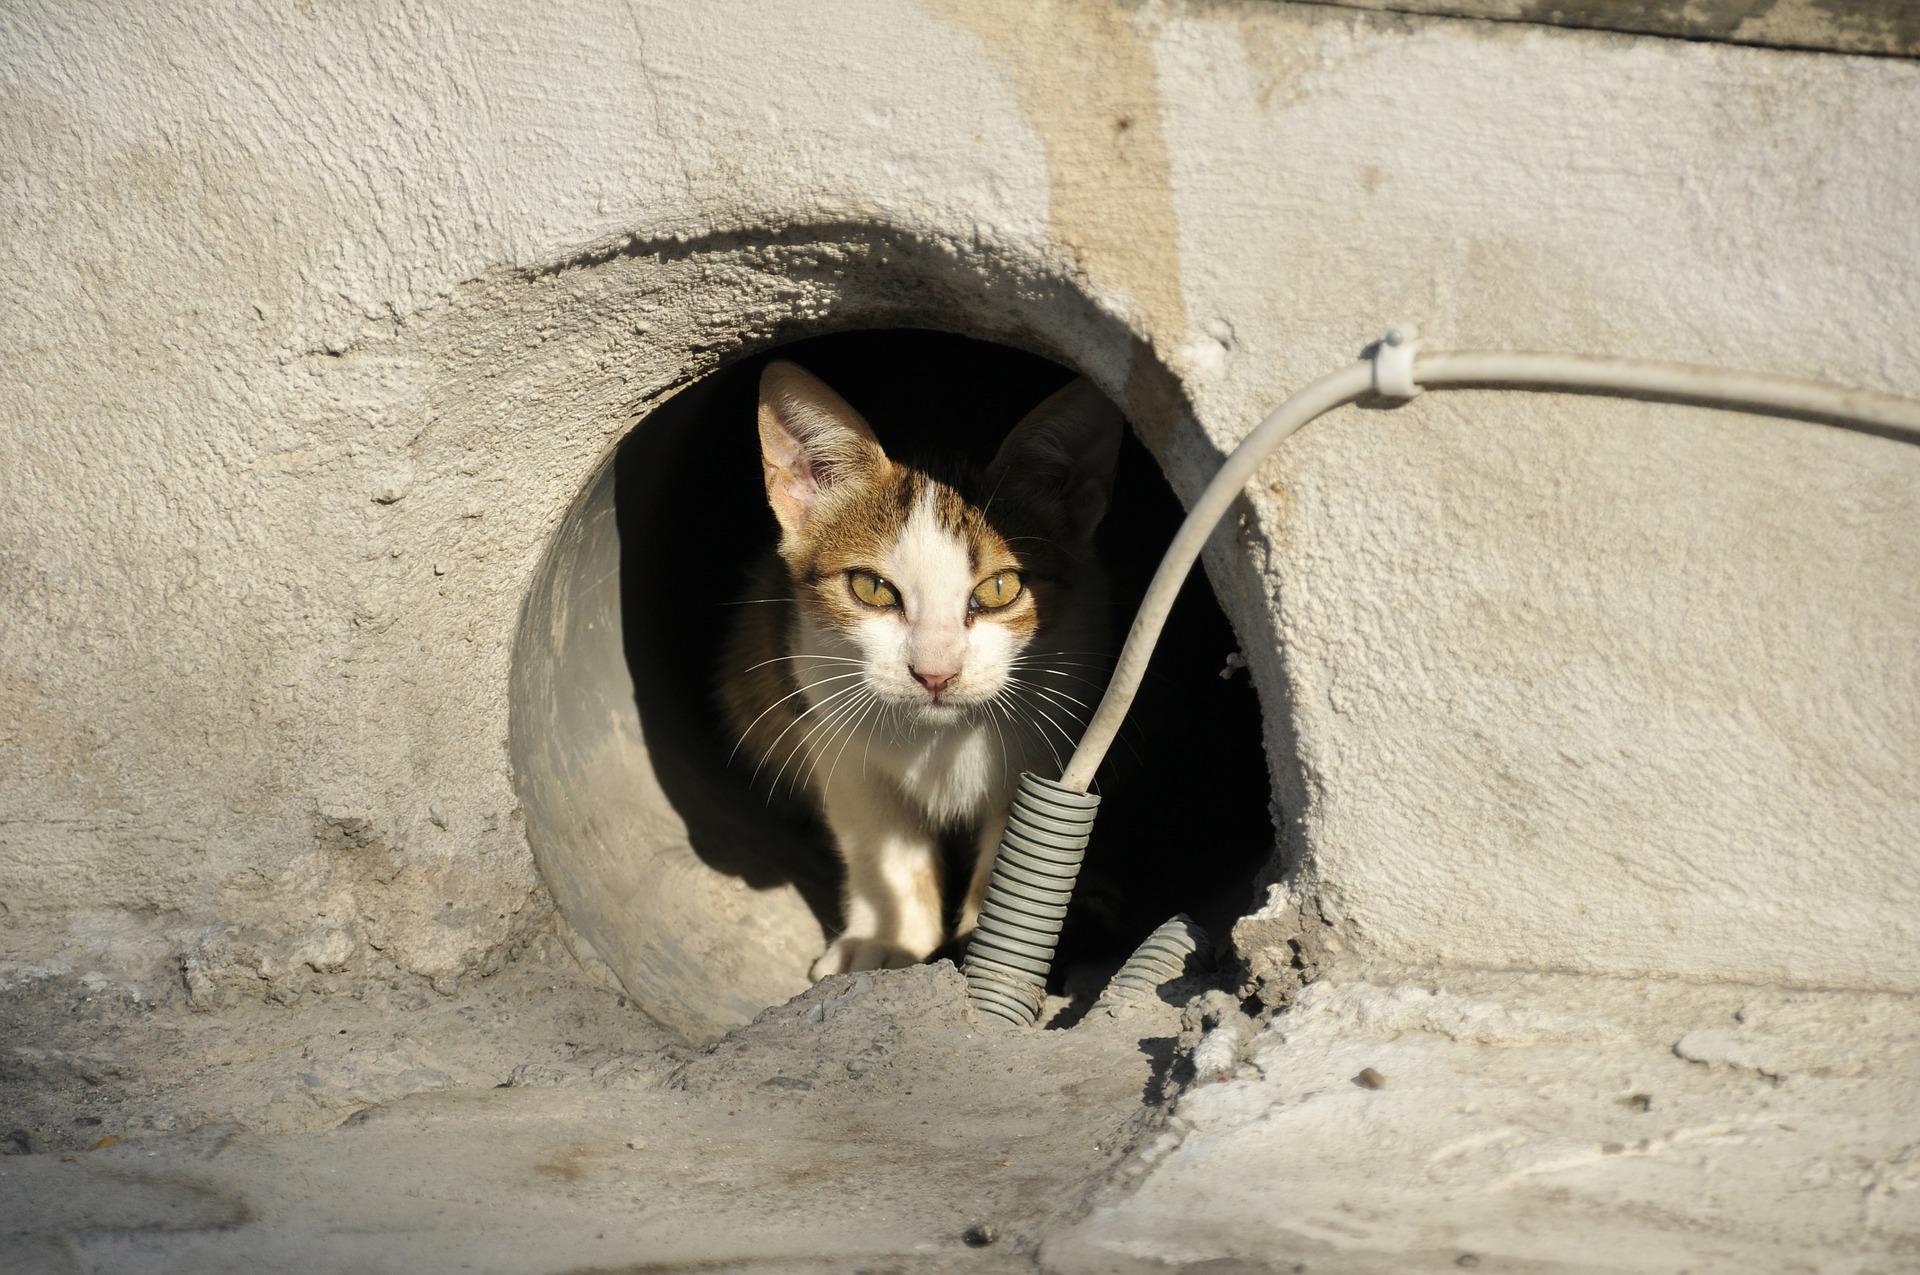 stray-cat-169113_1920.jpg